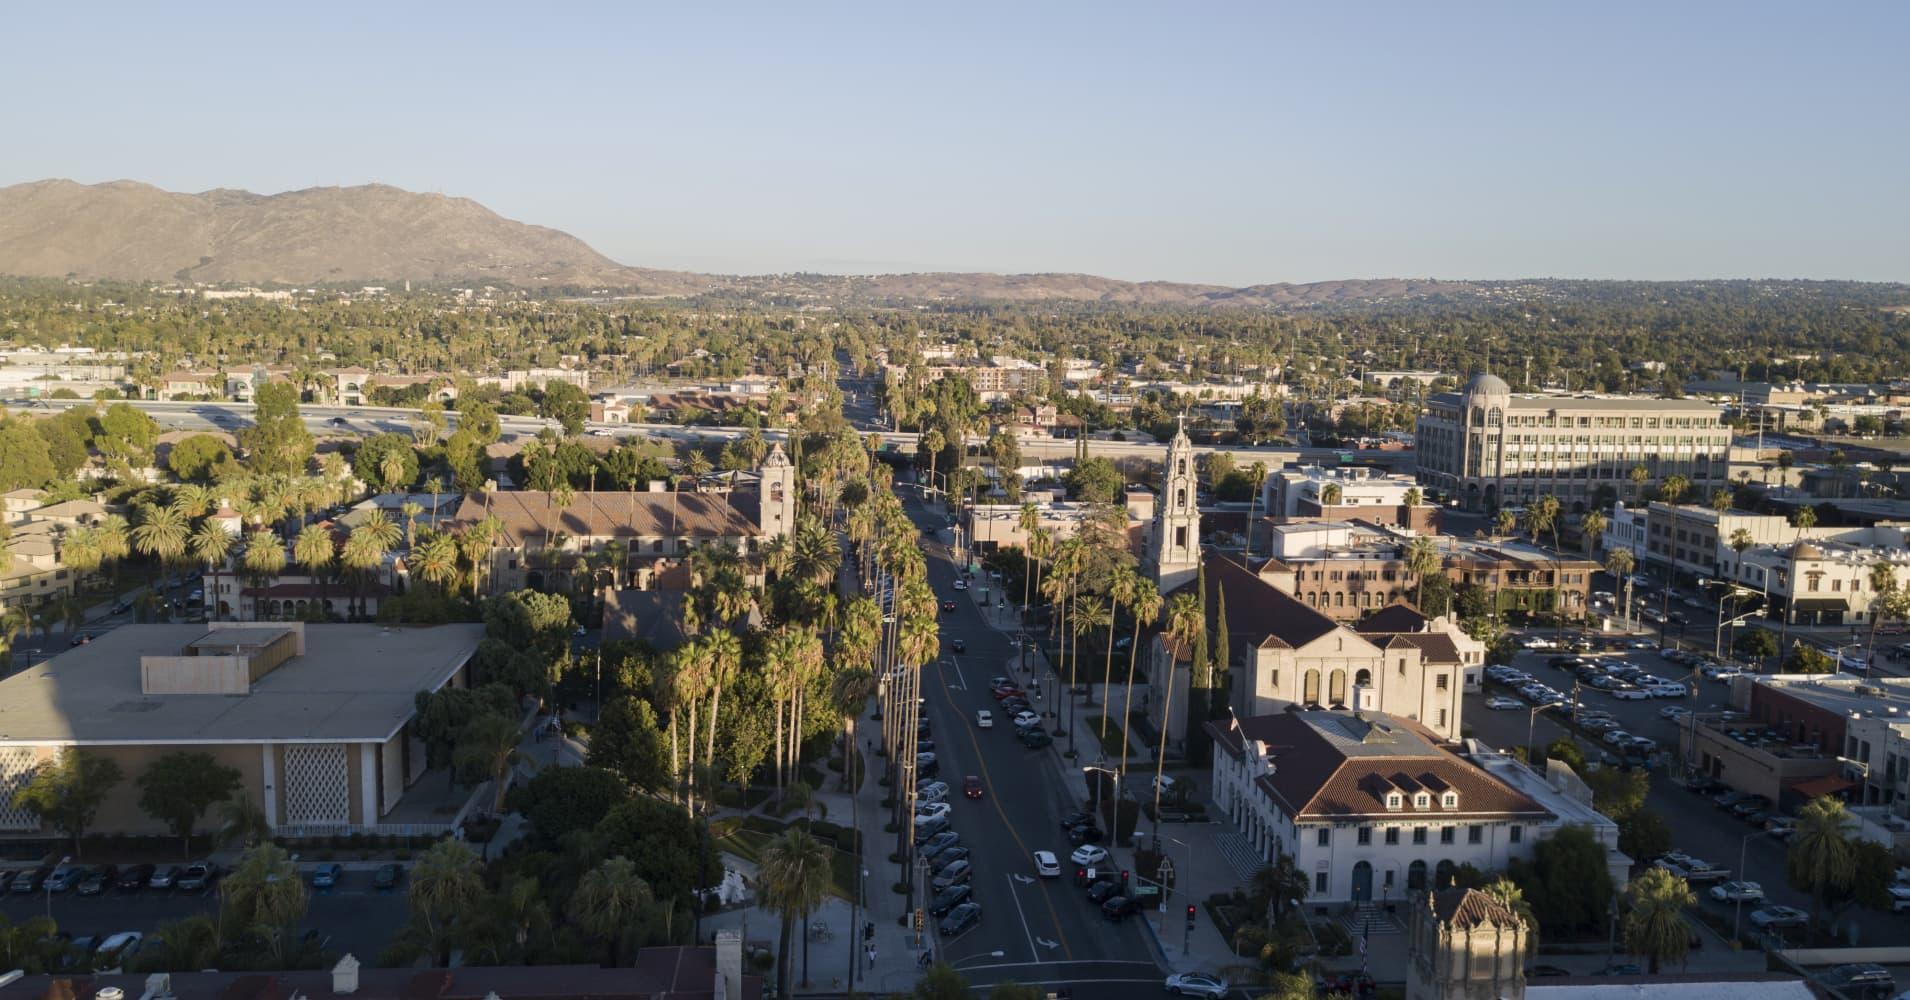 View of Riverside, California.